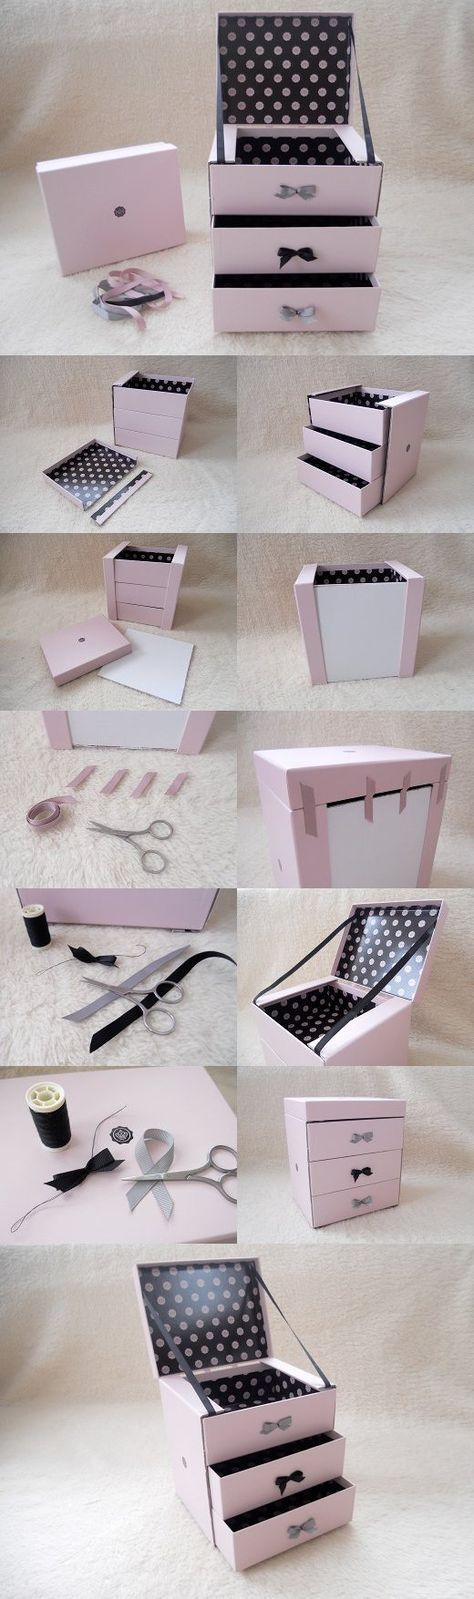 DIY Glossybox jewellery box (@Glossybox Brasil Brasil UK) | Step by step tutorial at www.floralandfreckled.co.uk